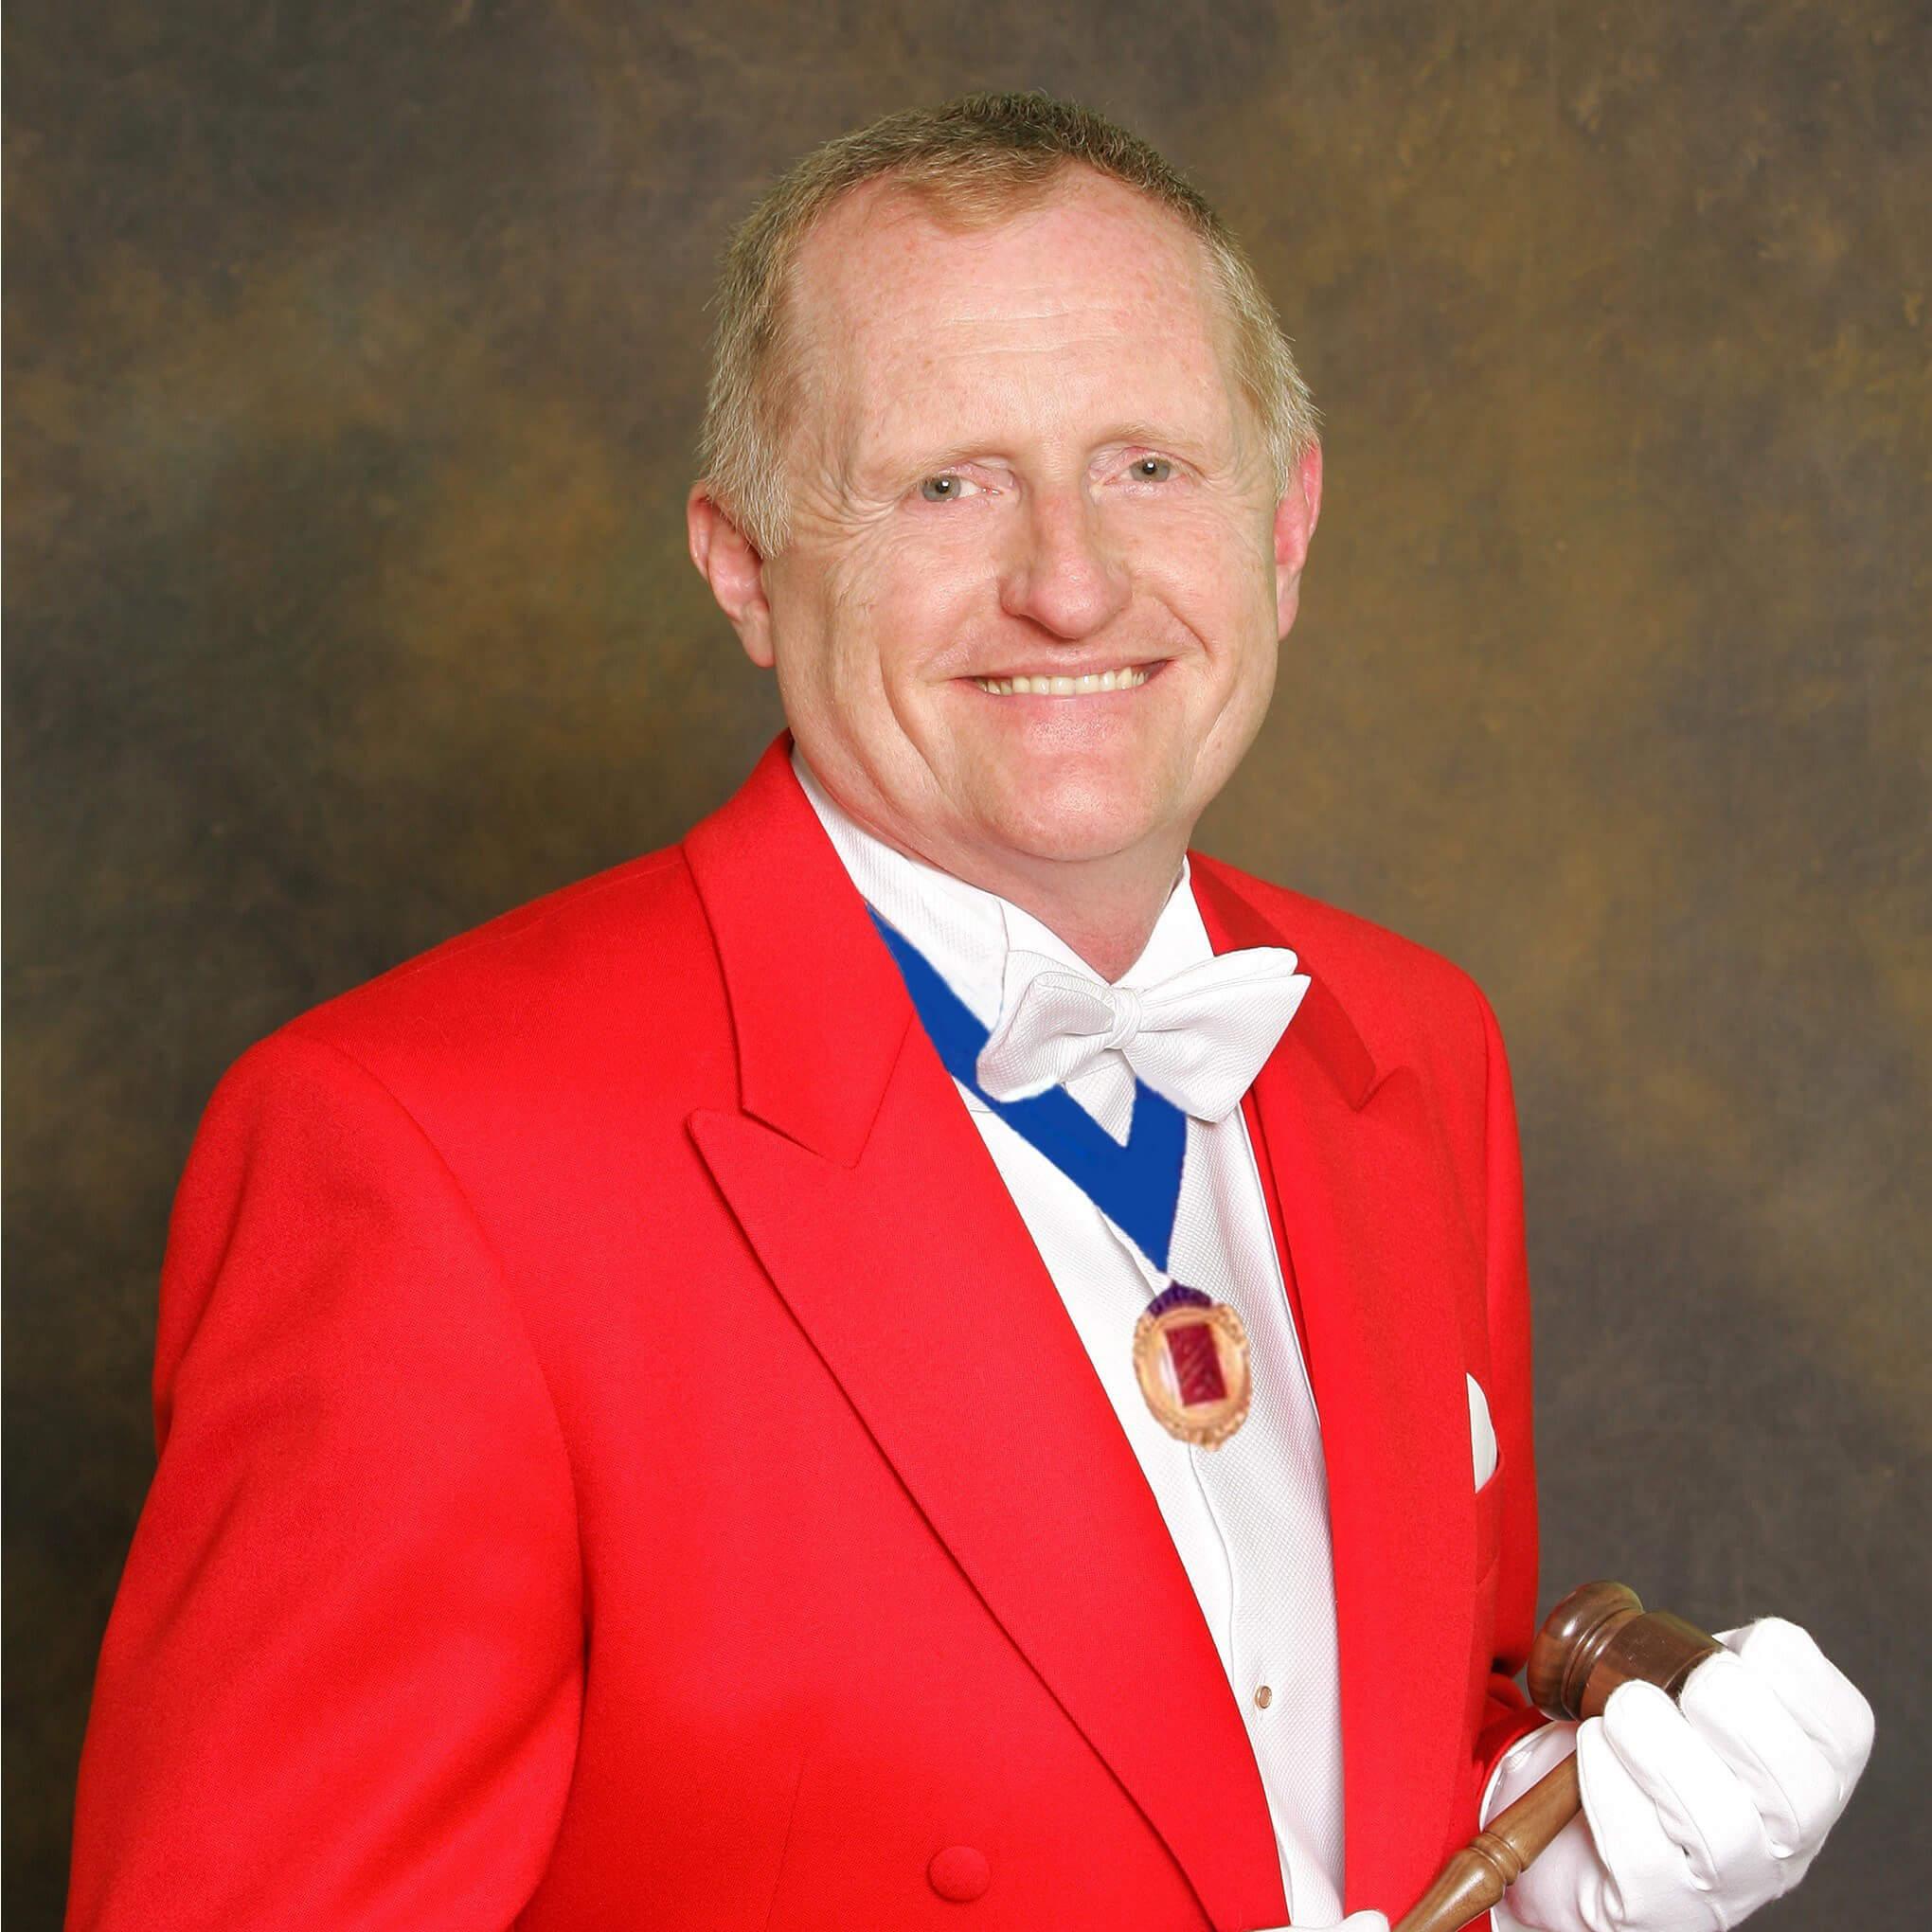 Professional Toastmaster and Master of Ceremonies Essex - Richard Cawte